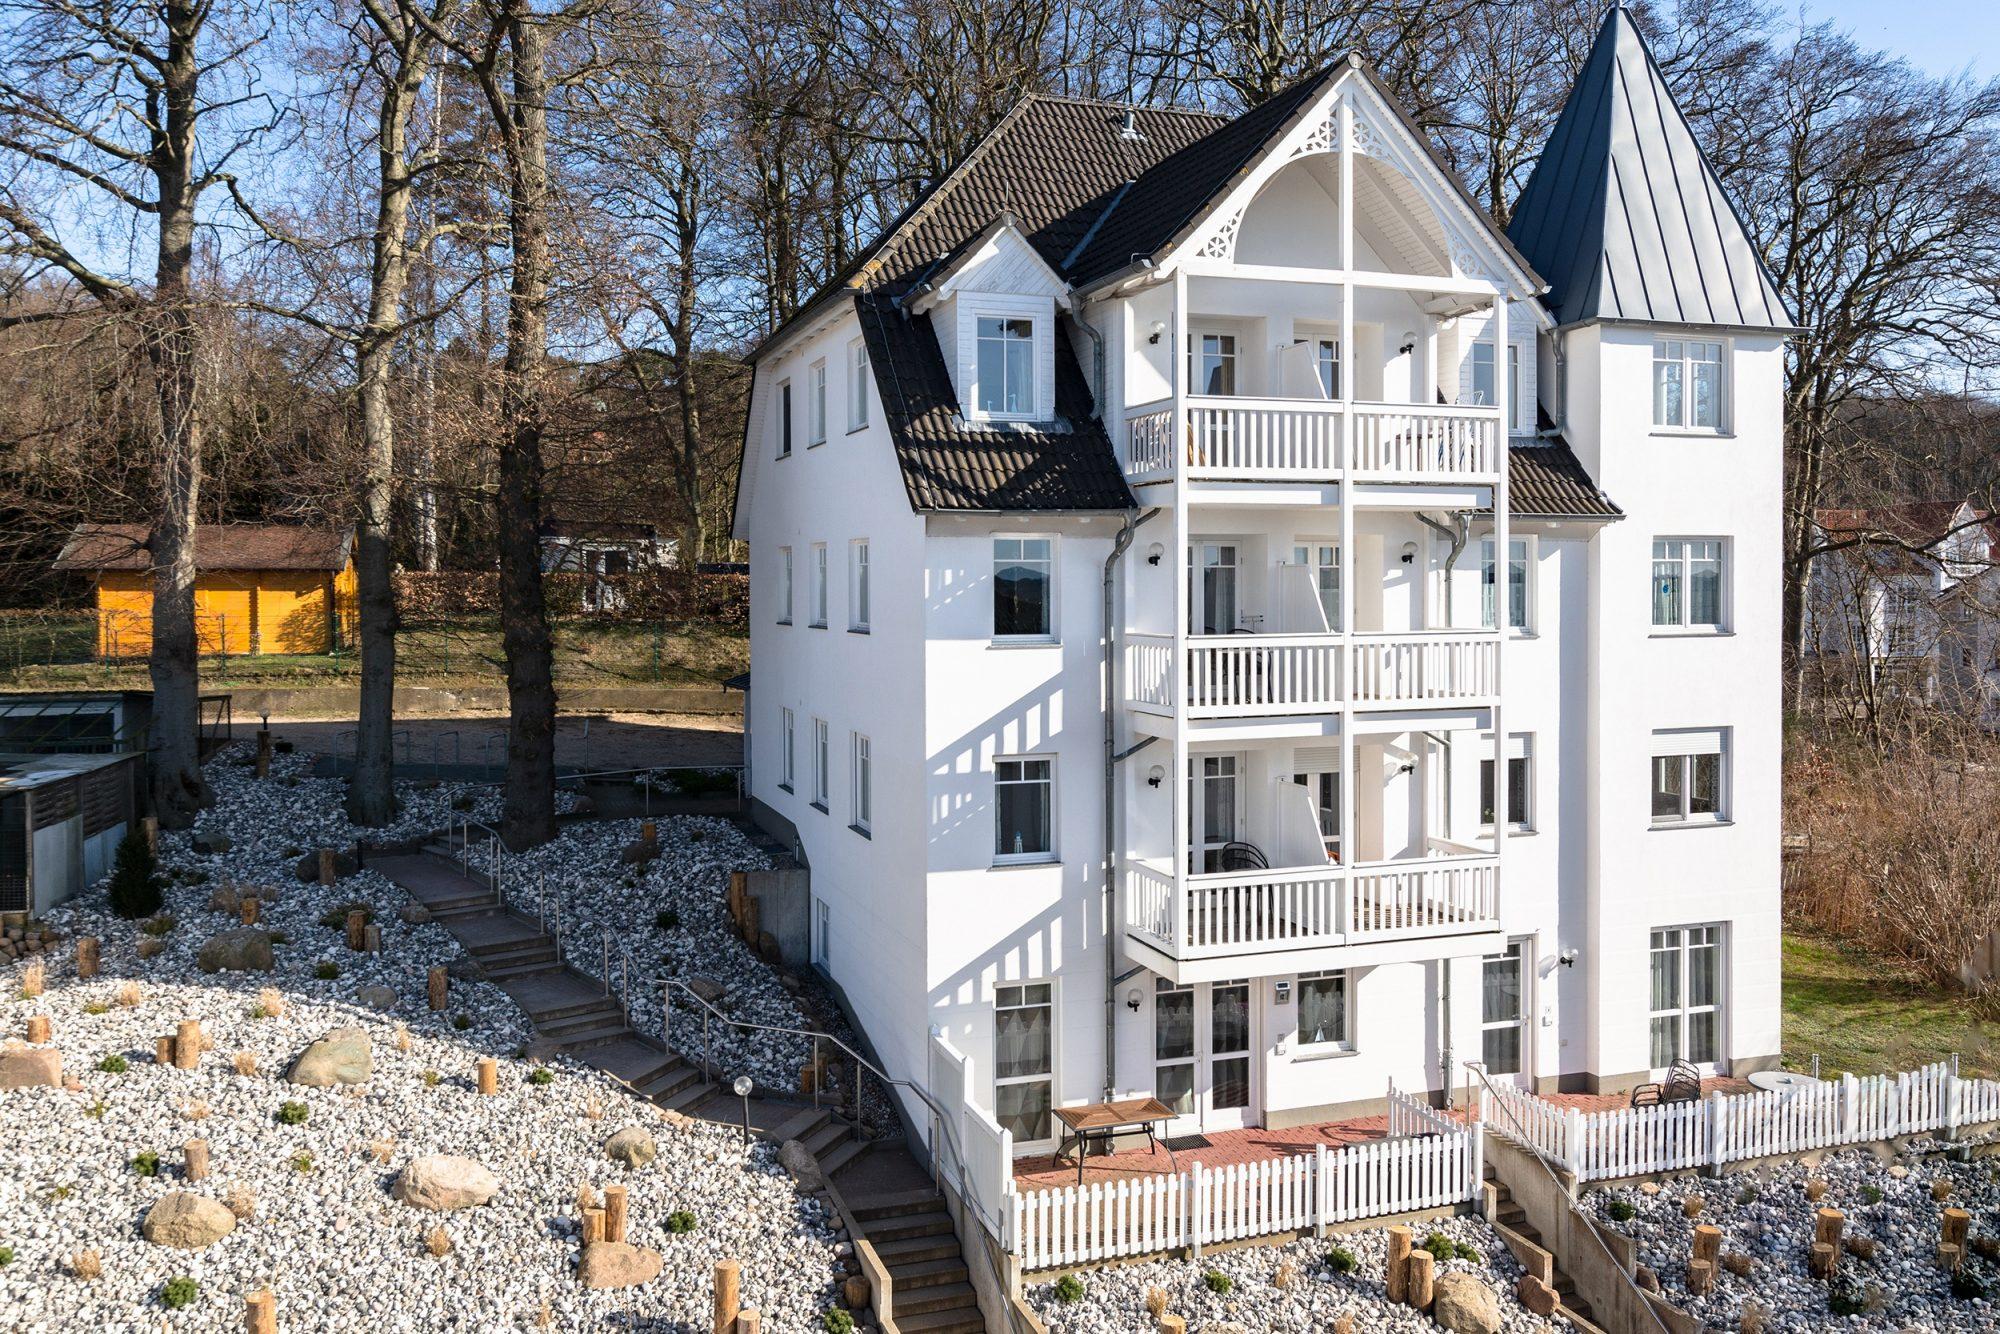 Fotografie Apartmentanlagen - Fotoservice mit Deko (c) TEXTAG GROUP Gabriele Hofer